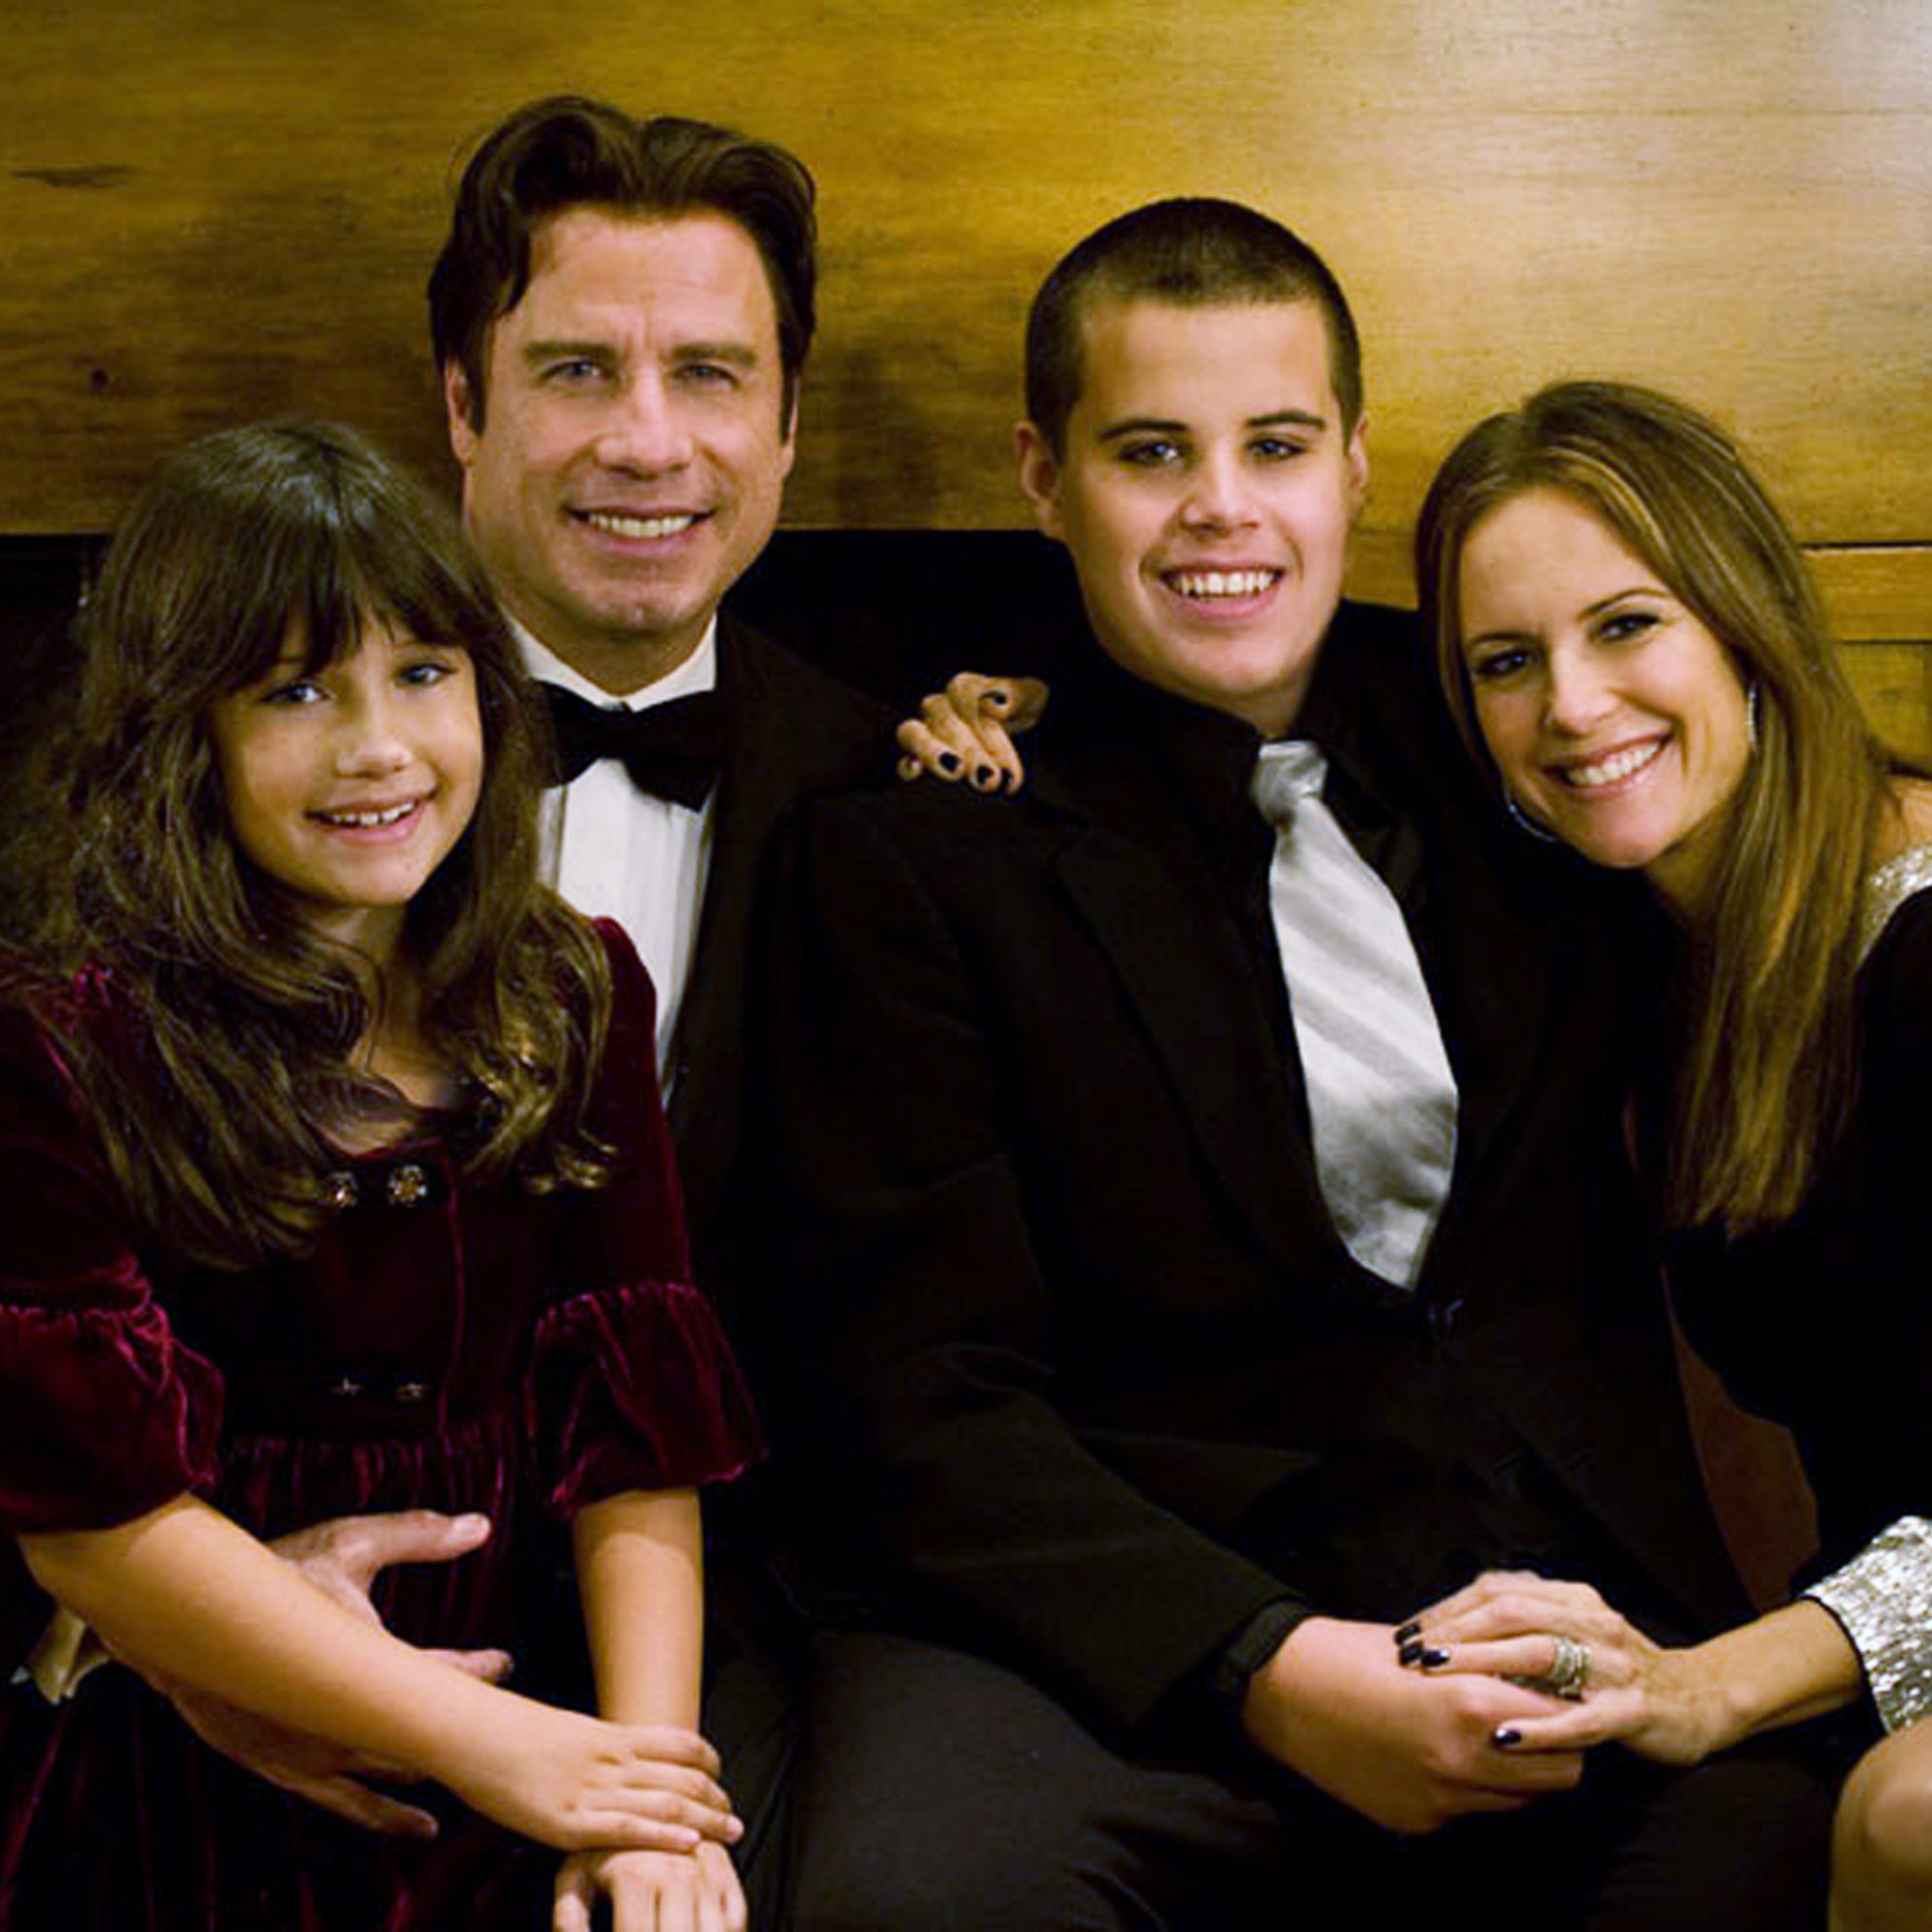 John Travolta Son Jett Getty Images